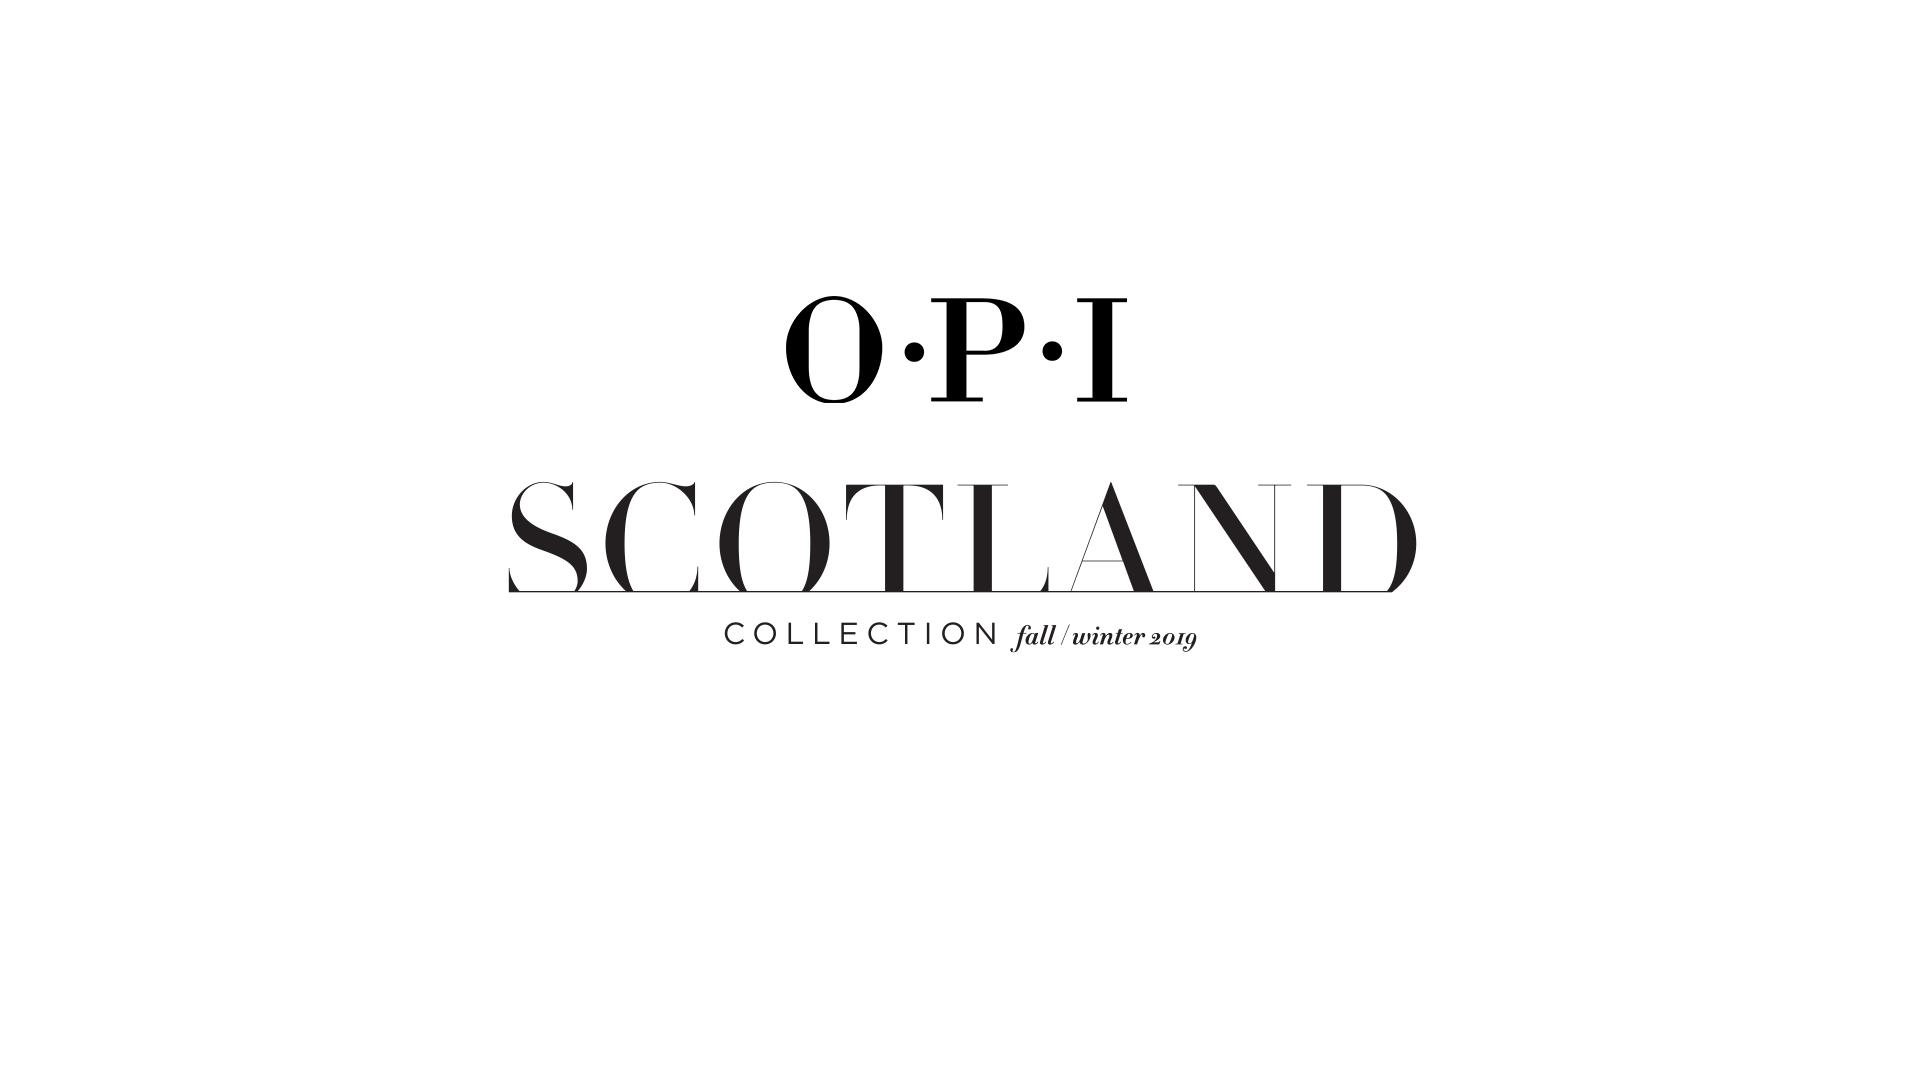 scotland opi.png